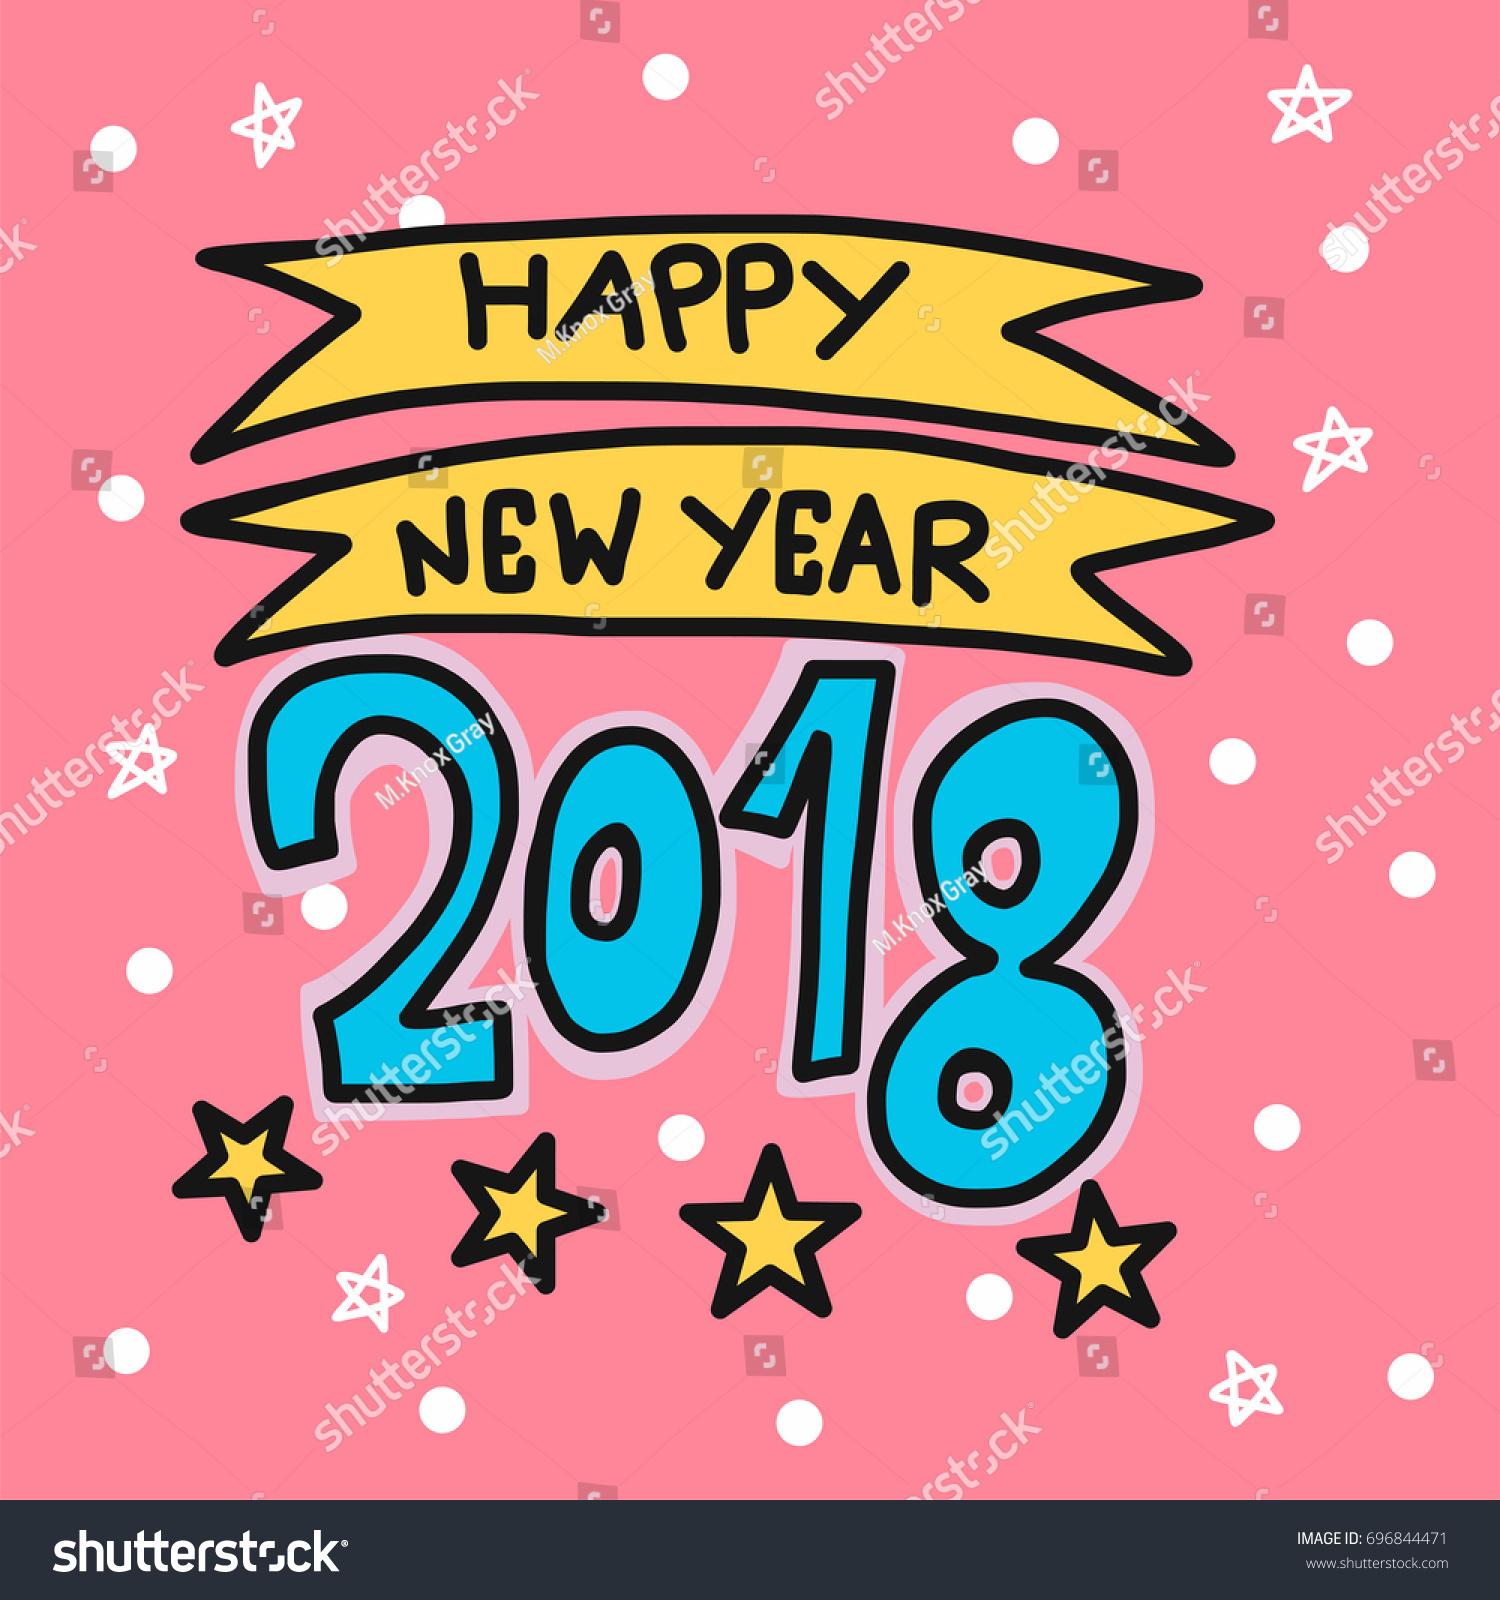 happy new year 2018 cartoon vector illustration